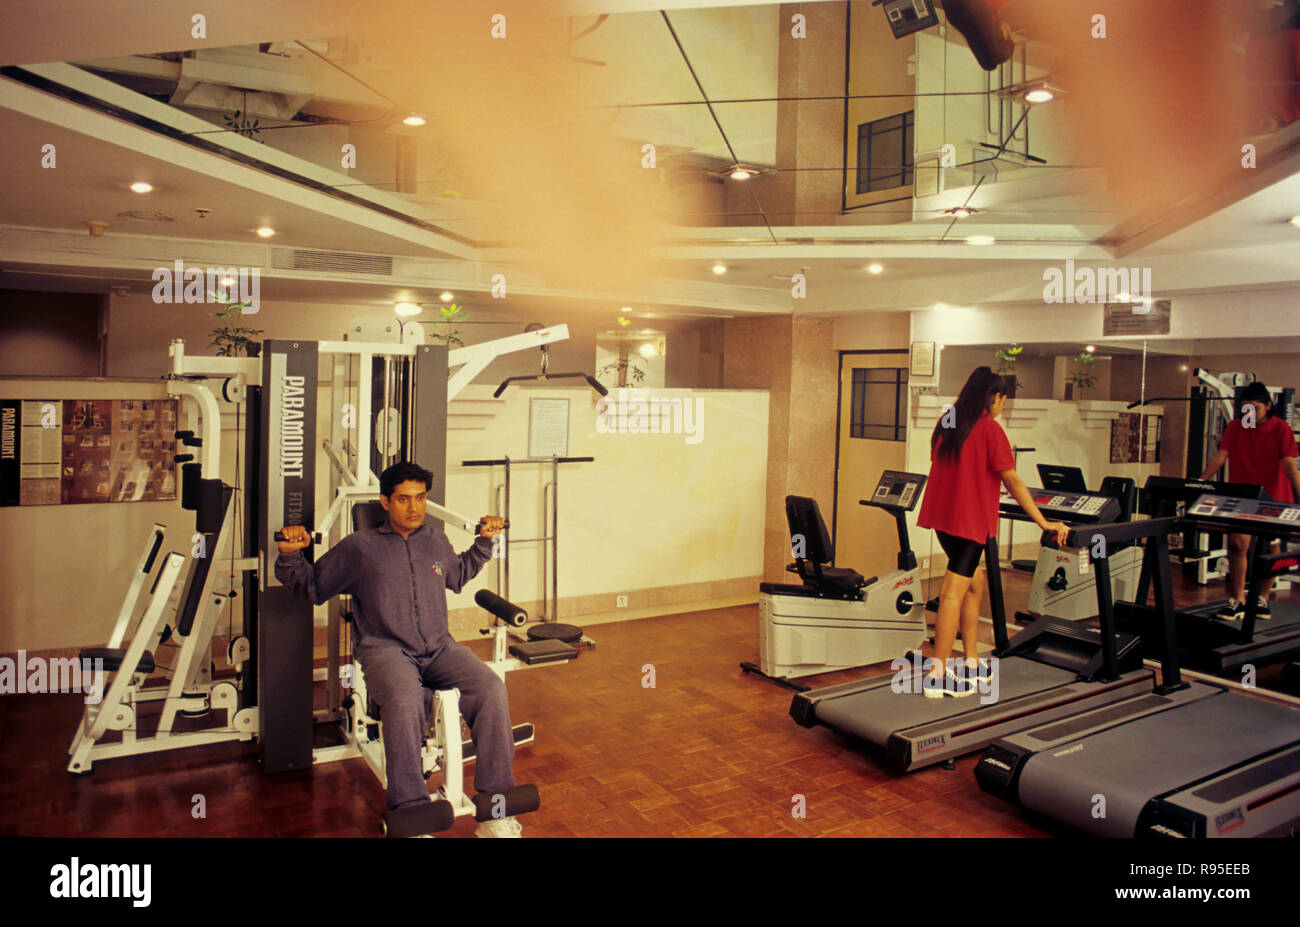 Health Club, Rajputana Palace, Jaipur, Rajasthan, india MR.NO.414.415 - Stock Image